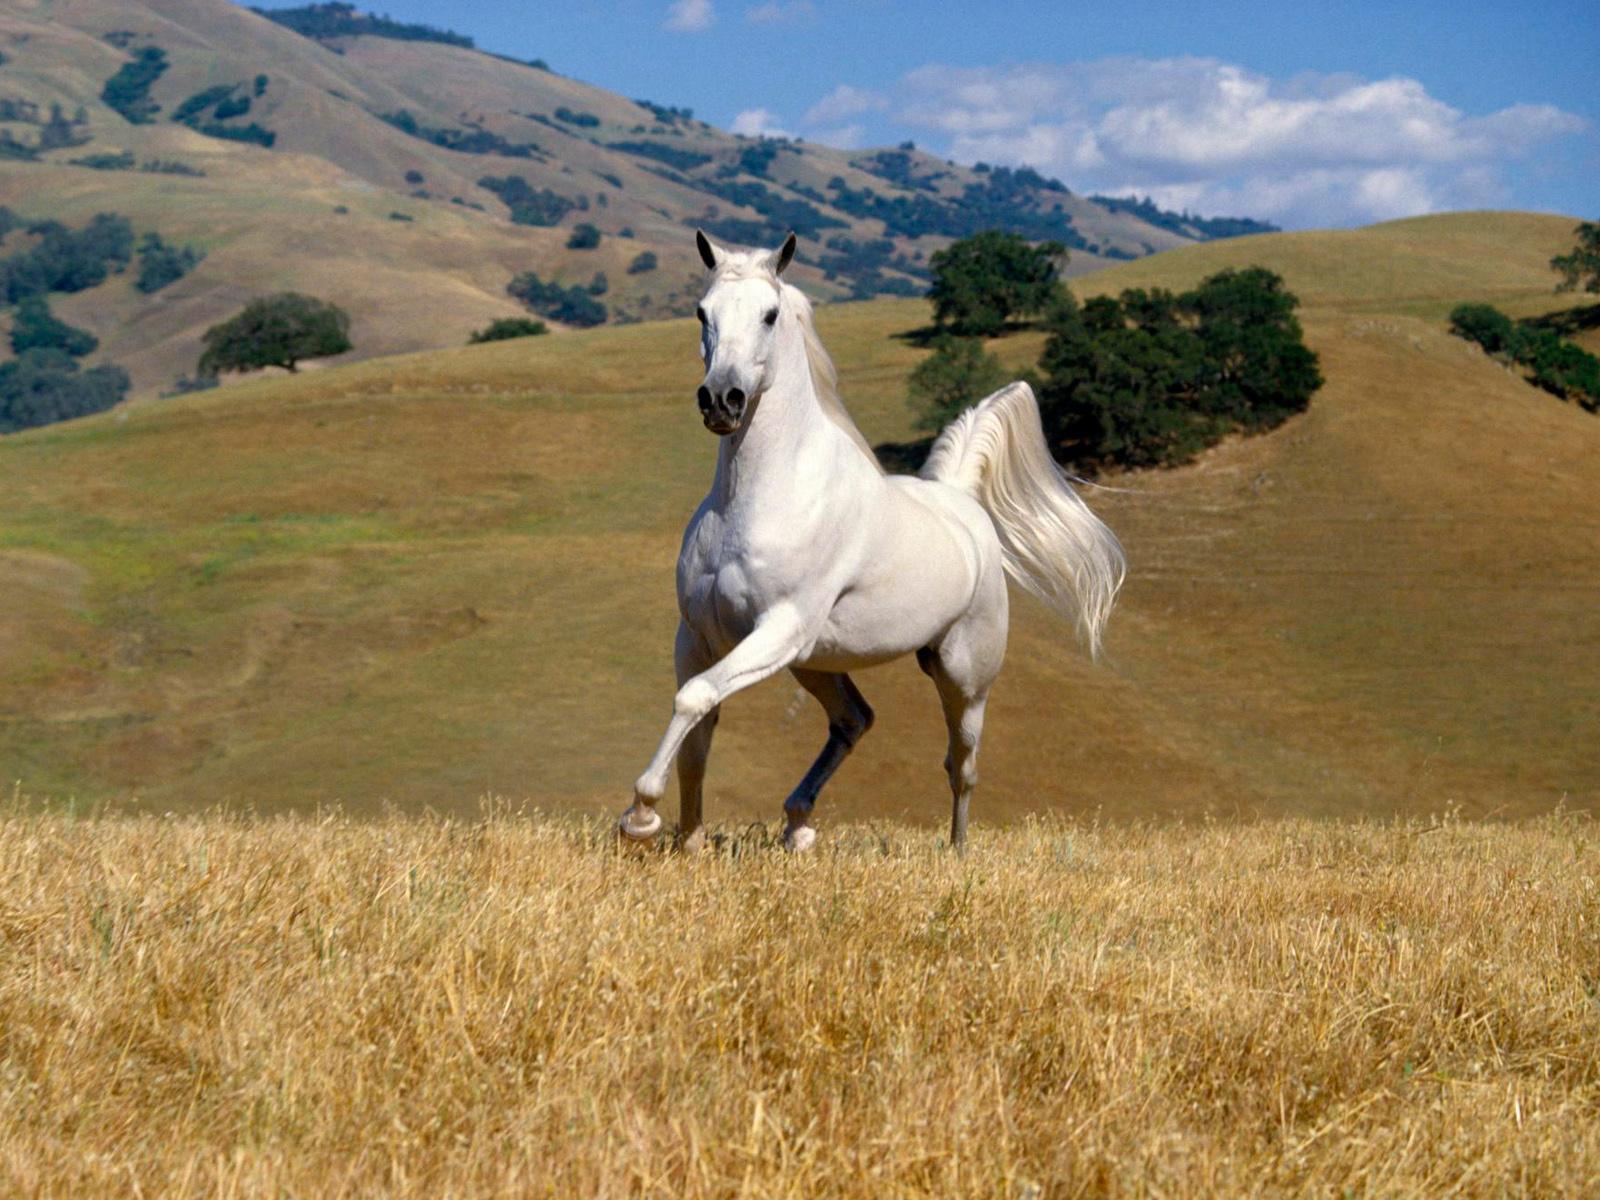 Wallpapers fair exclusive 3d horse screensaver wallpaper for Exclusive 3d wallpaper